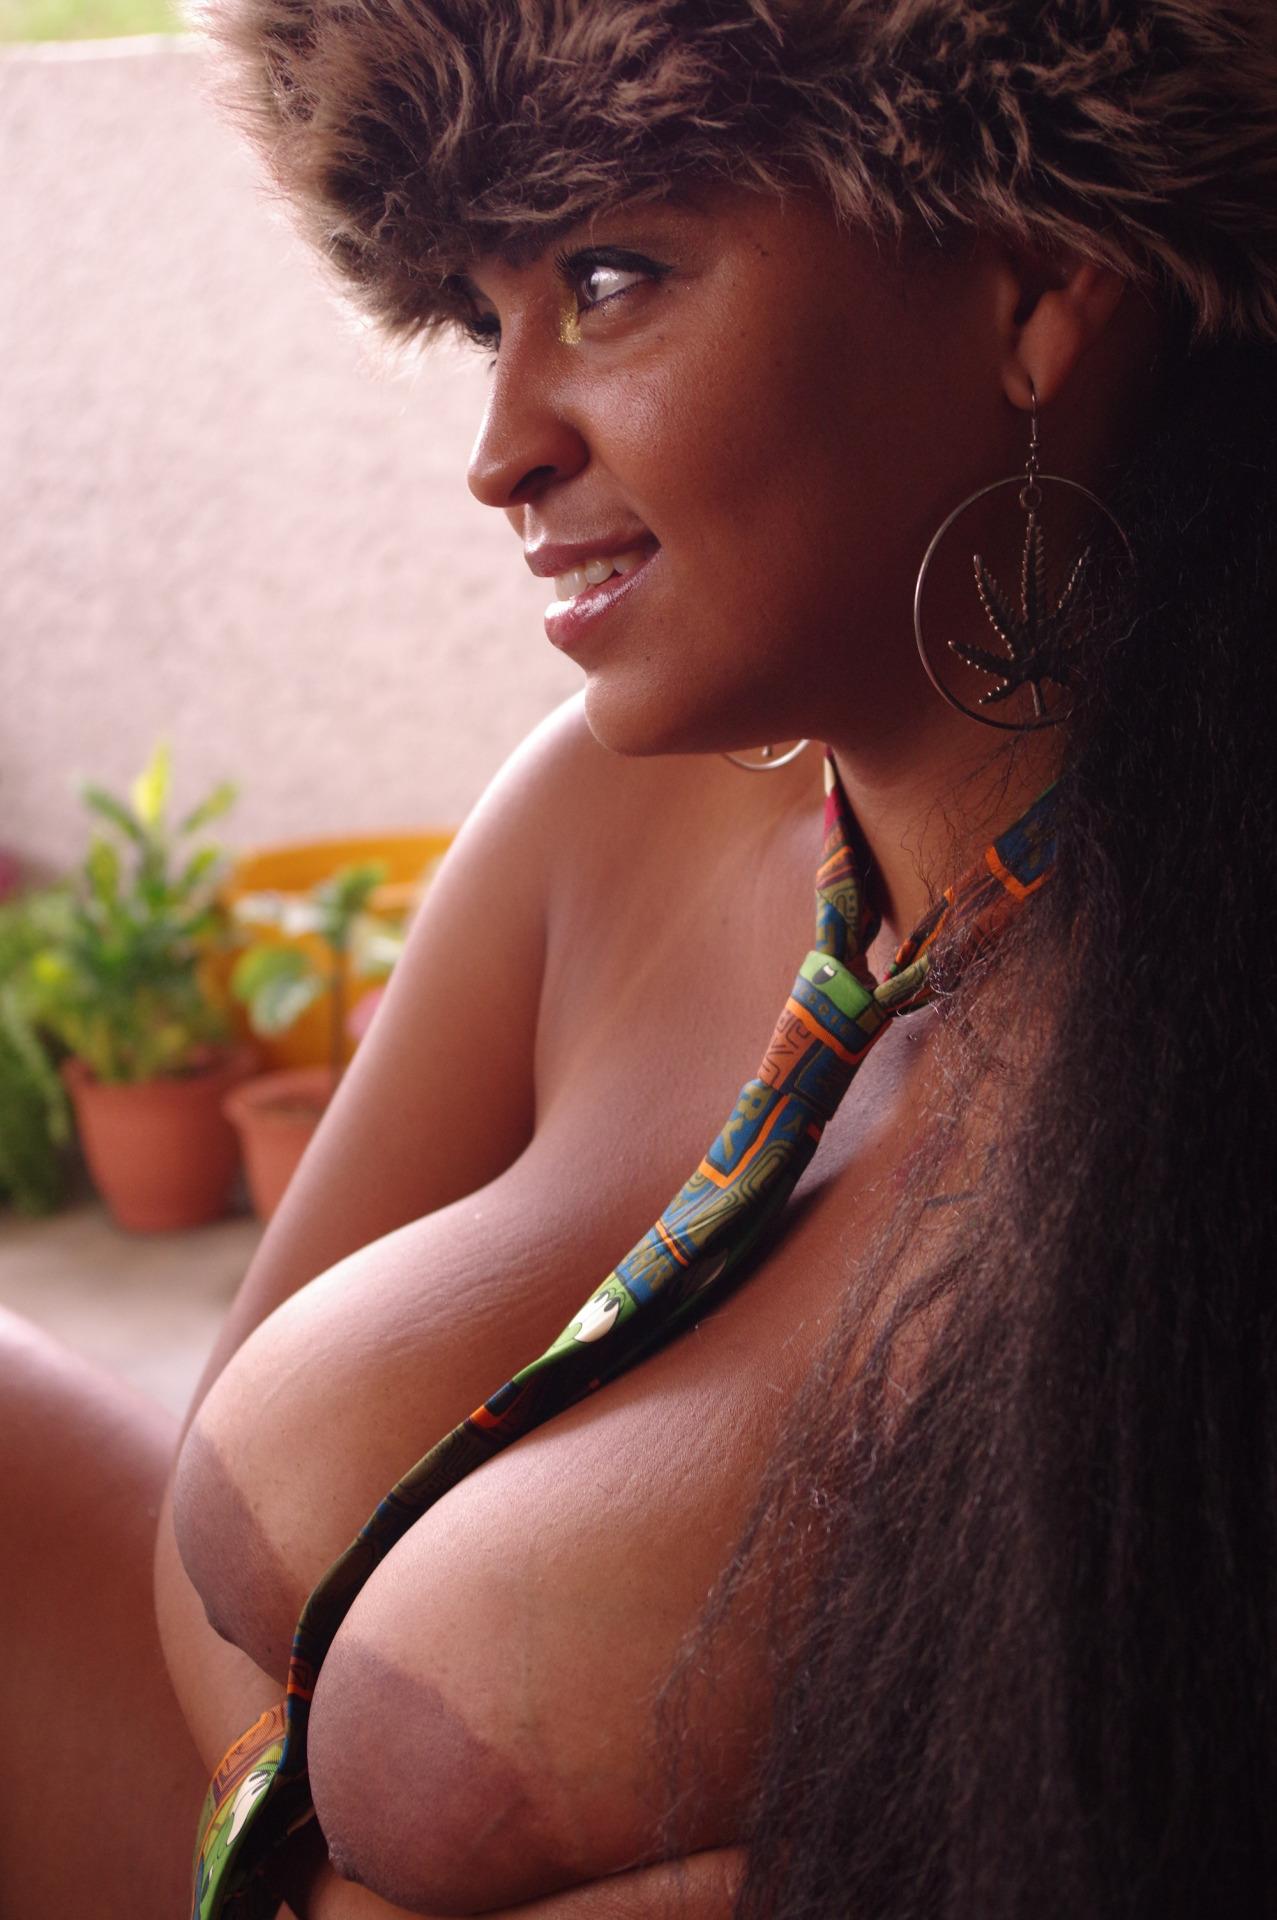 envie de webcam femme nue  09